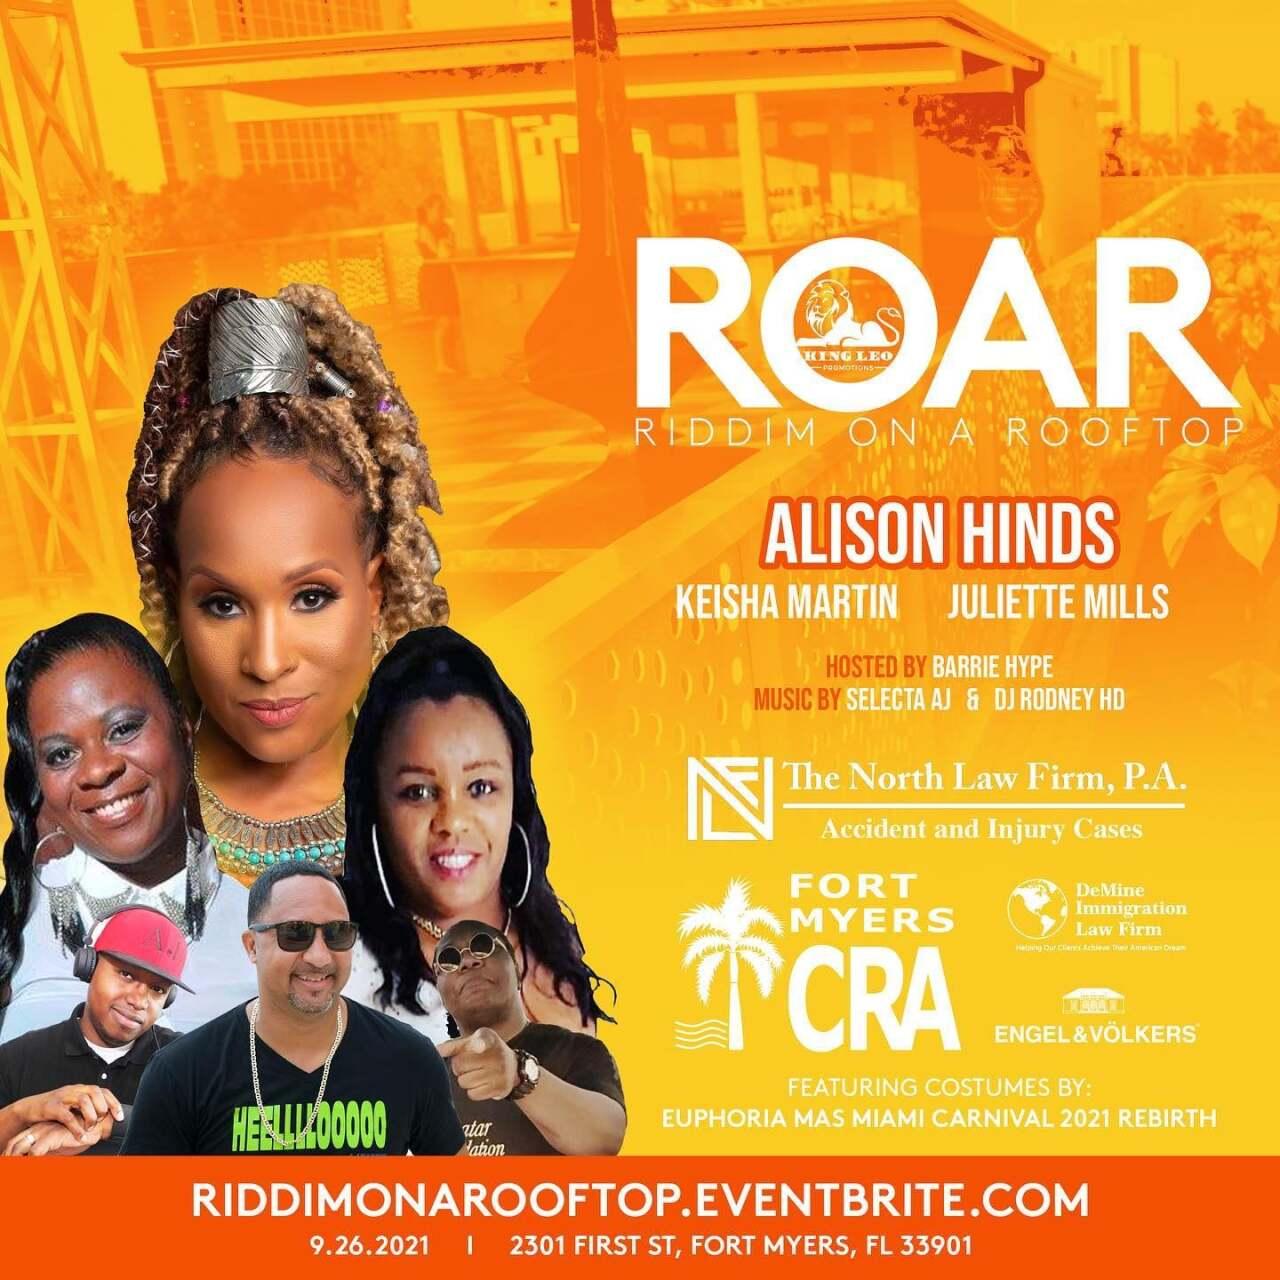 """ROAR"" event comes to Southwest Florida"